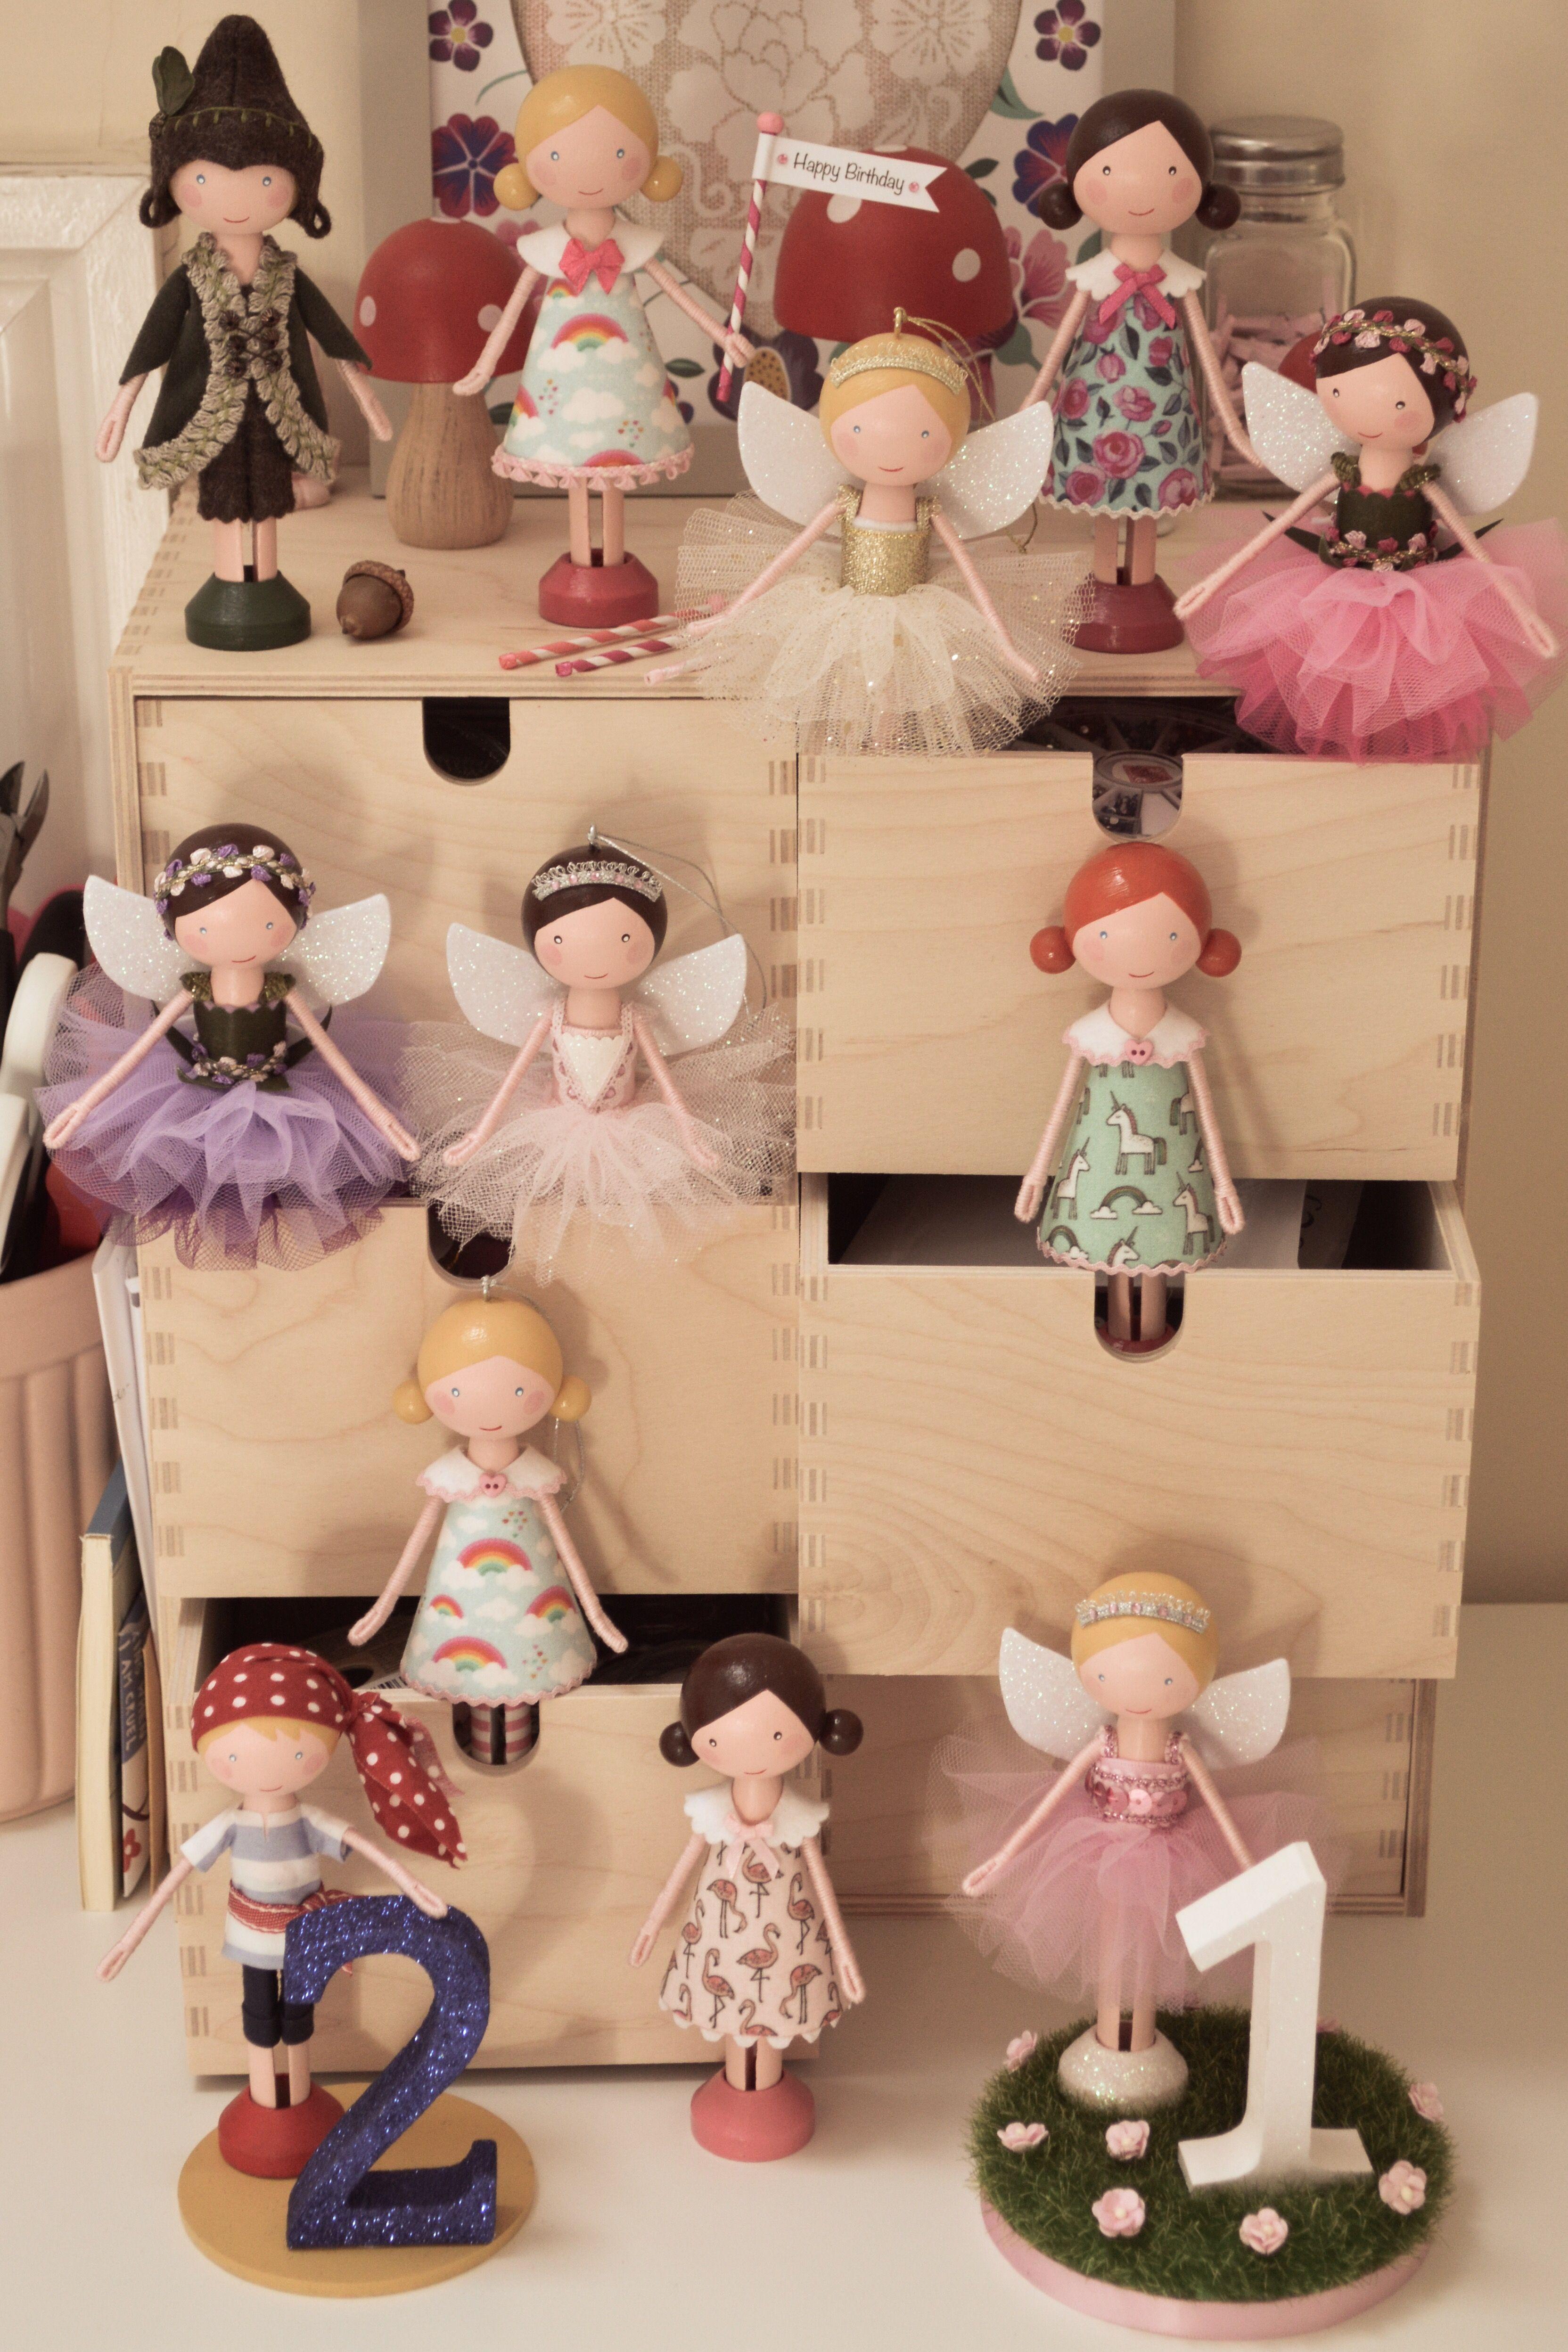 Peg Doll Clothespin Doll Flossy Bobbins Makery Craft Ideas